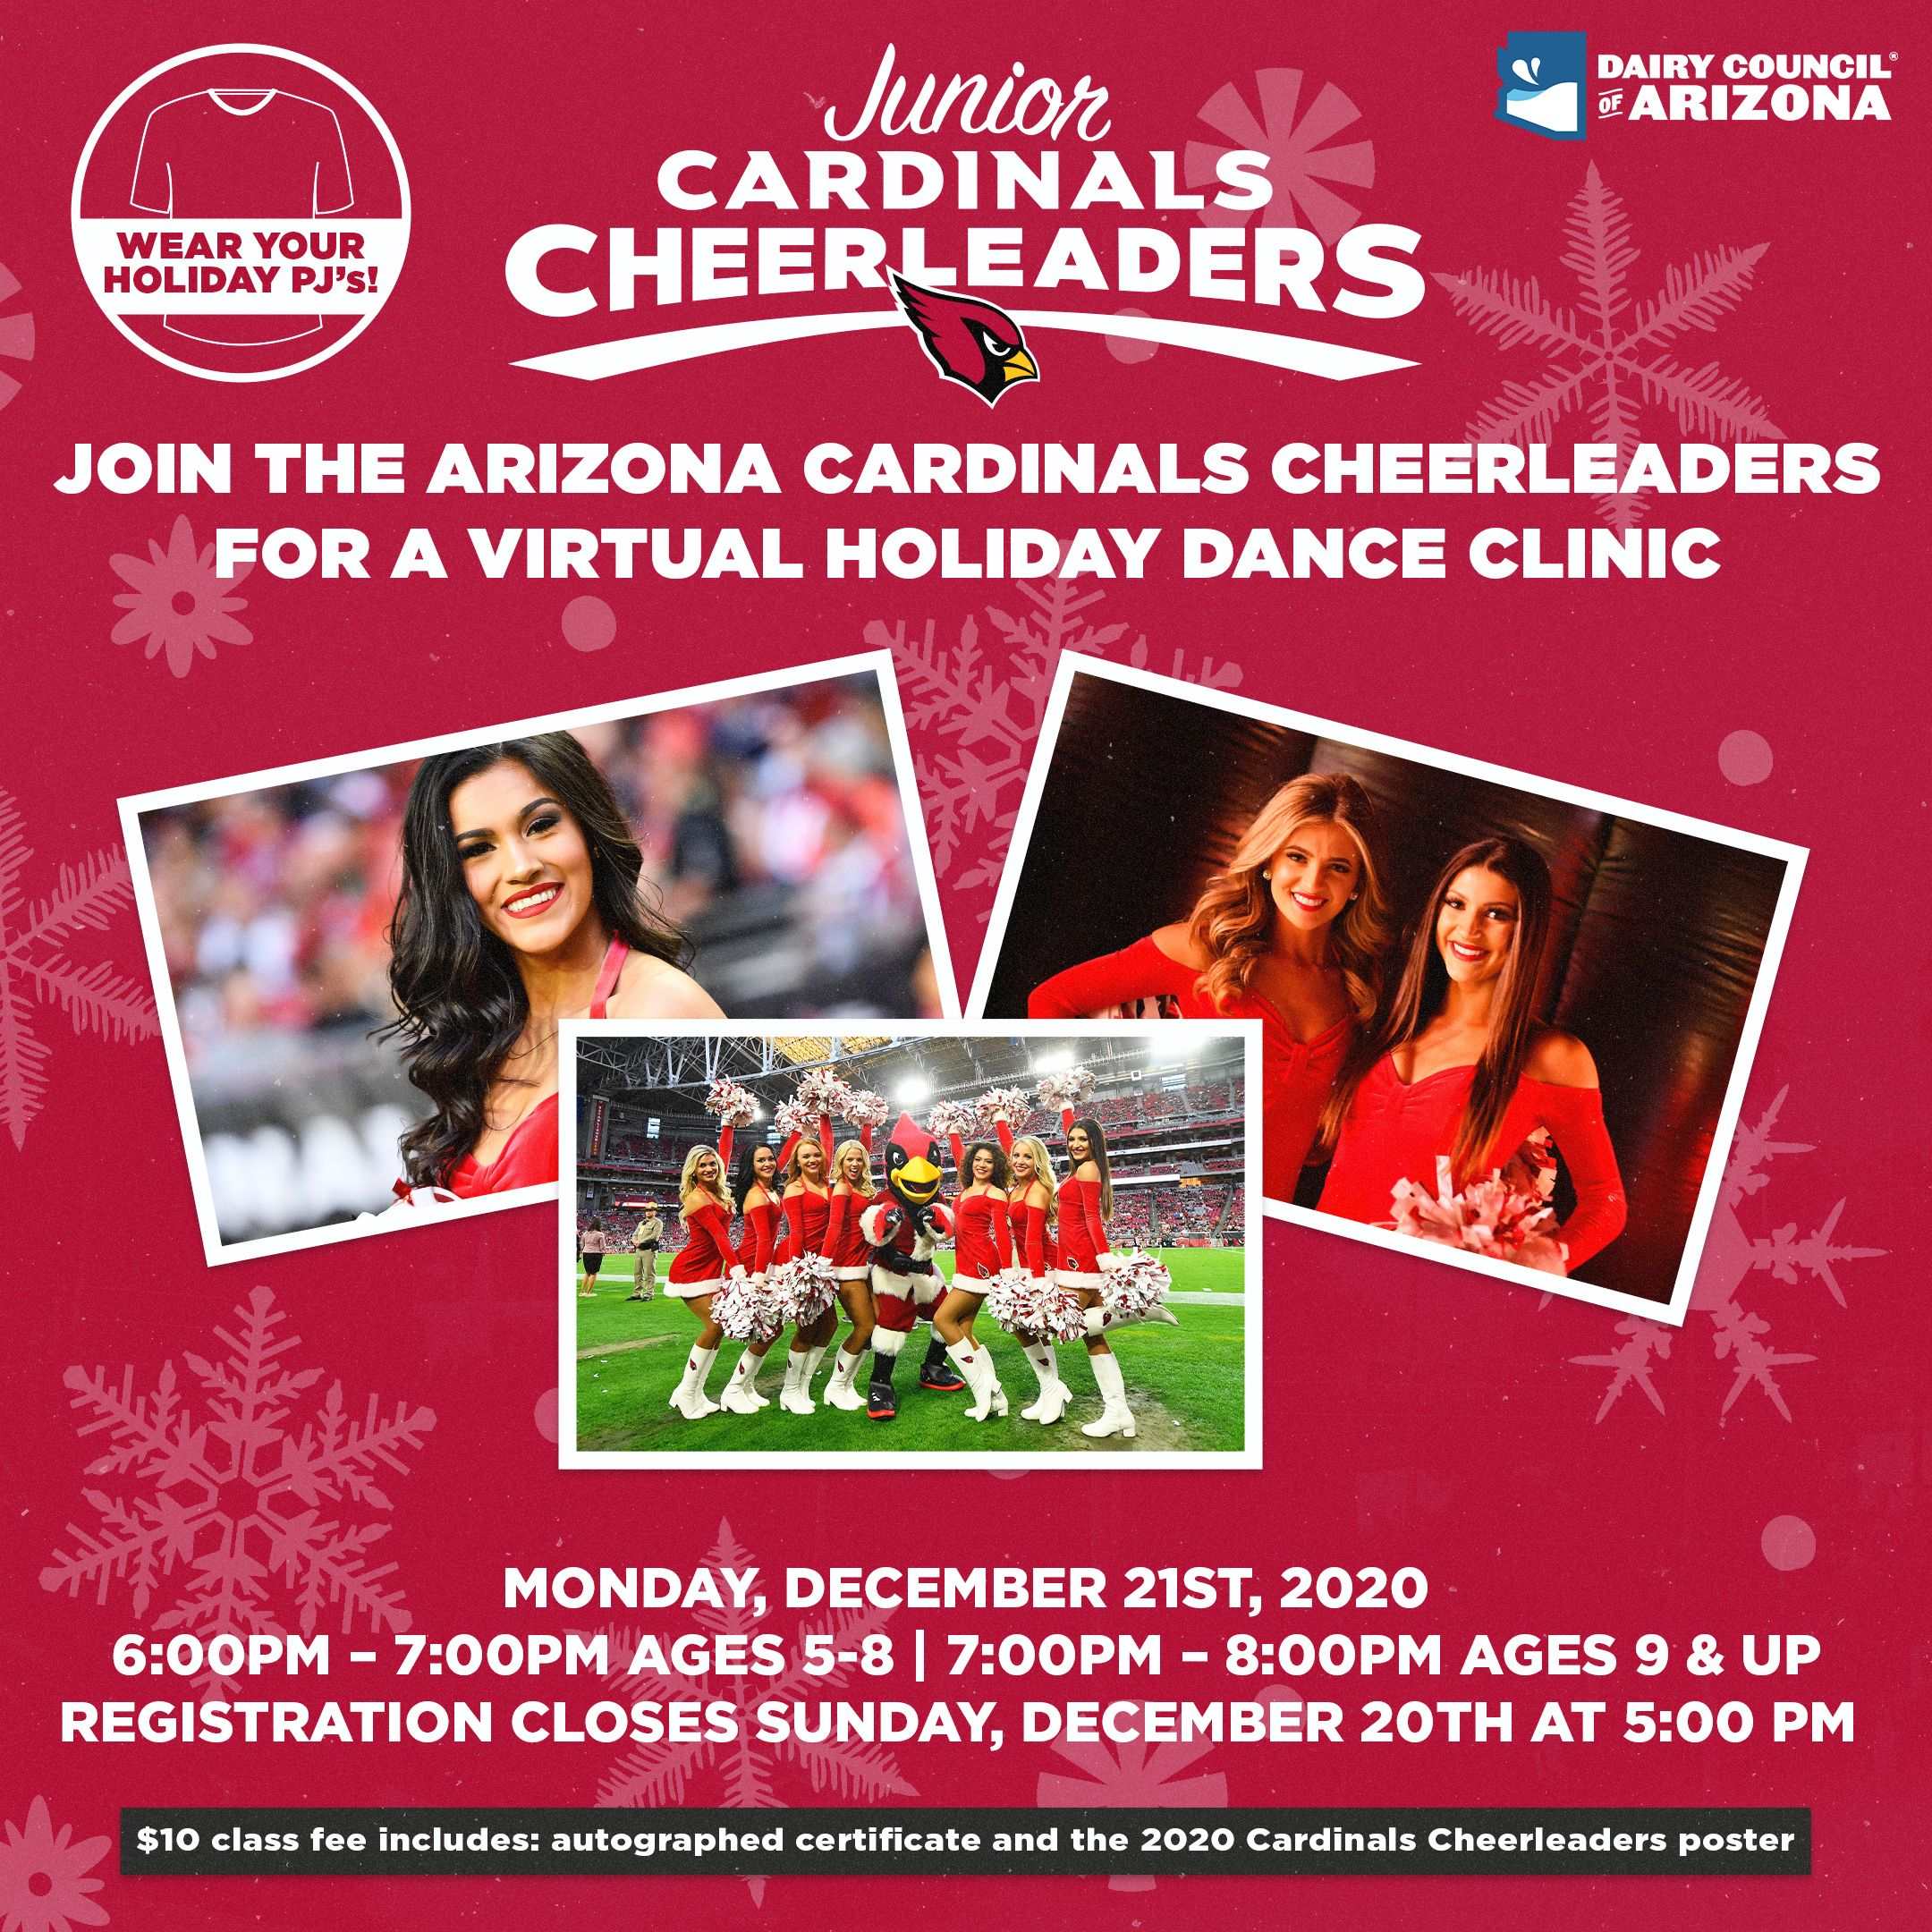 Junior Cheer Virtual Holiday Dance Clinic